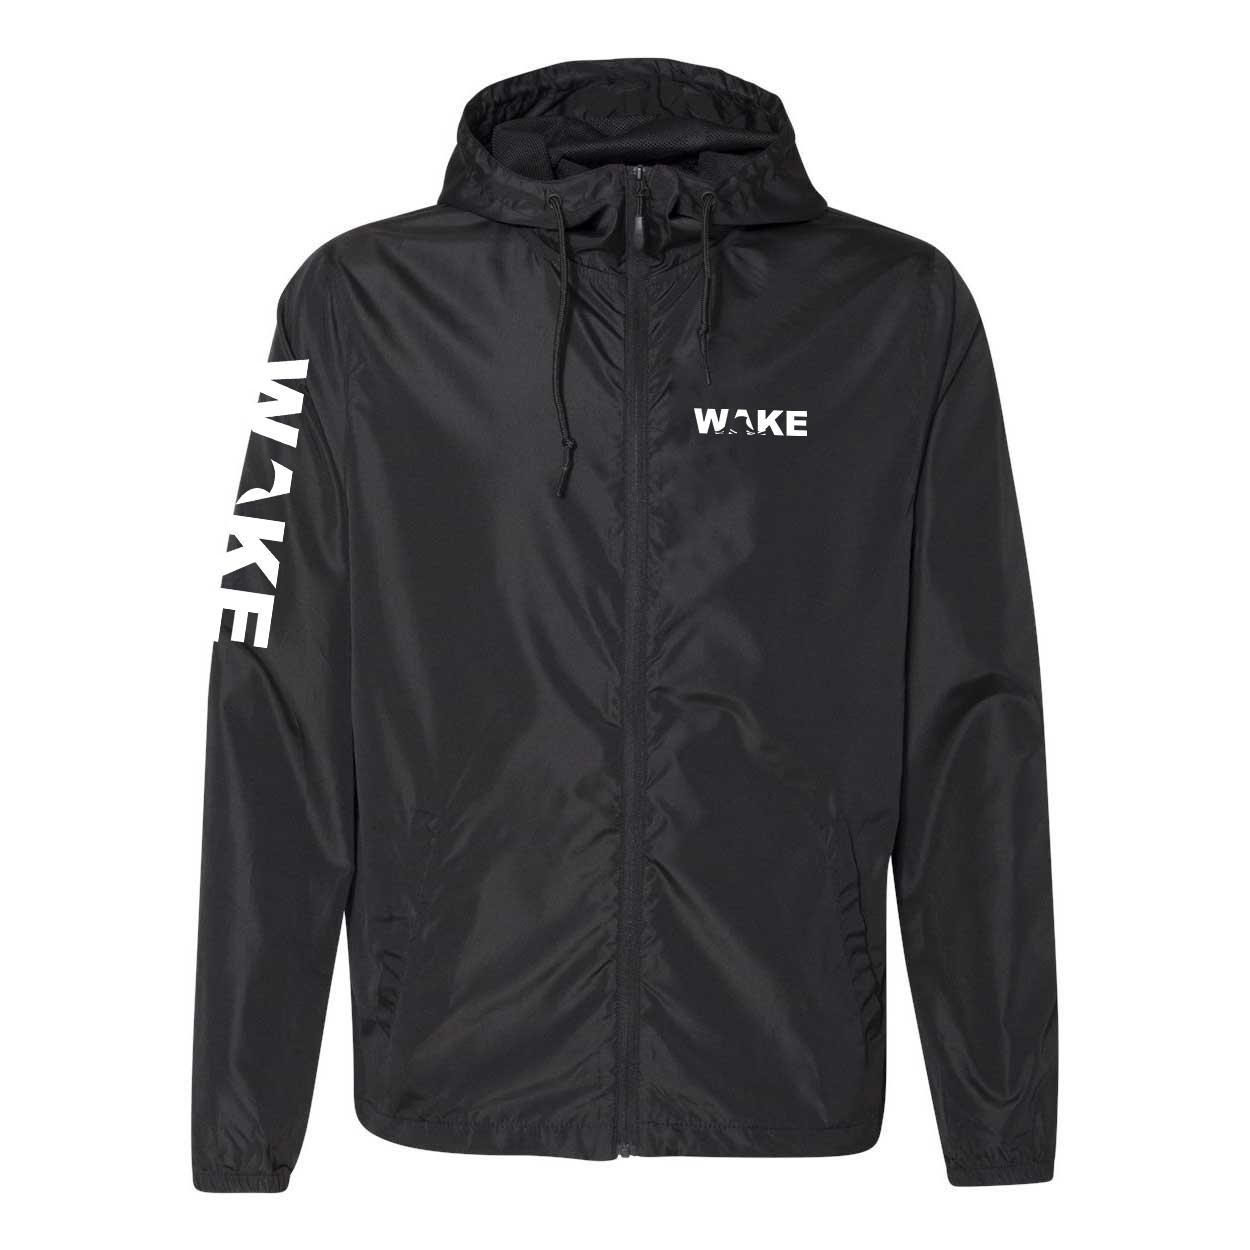 Wake Wave Logo Classic Lightweight Windbreaker Black (White Logo)